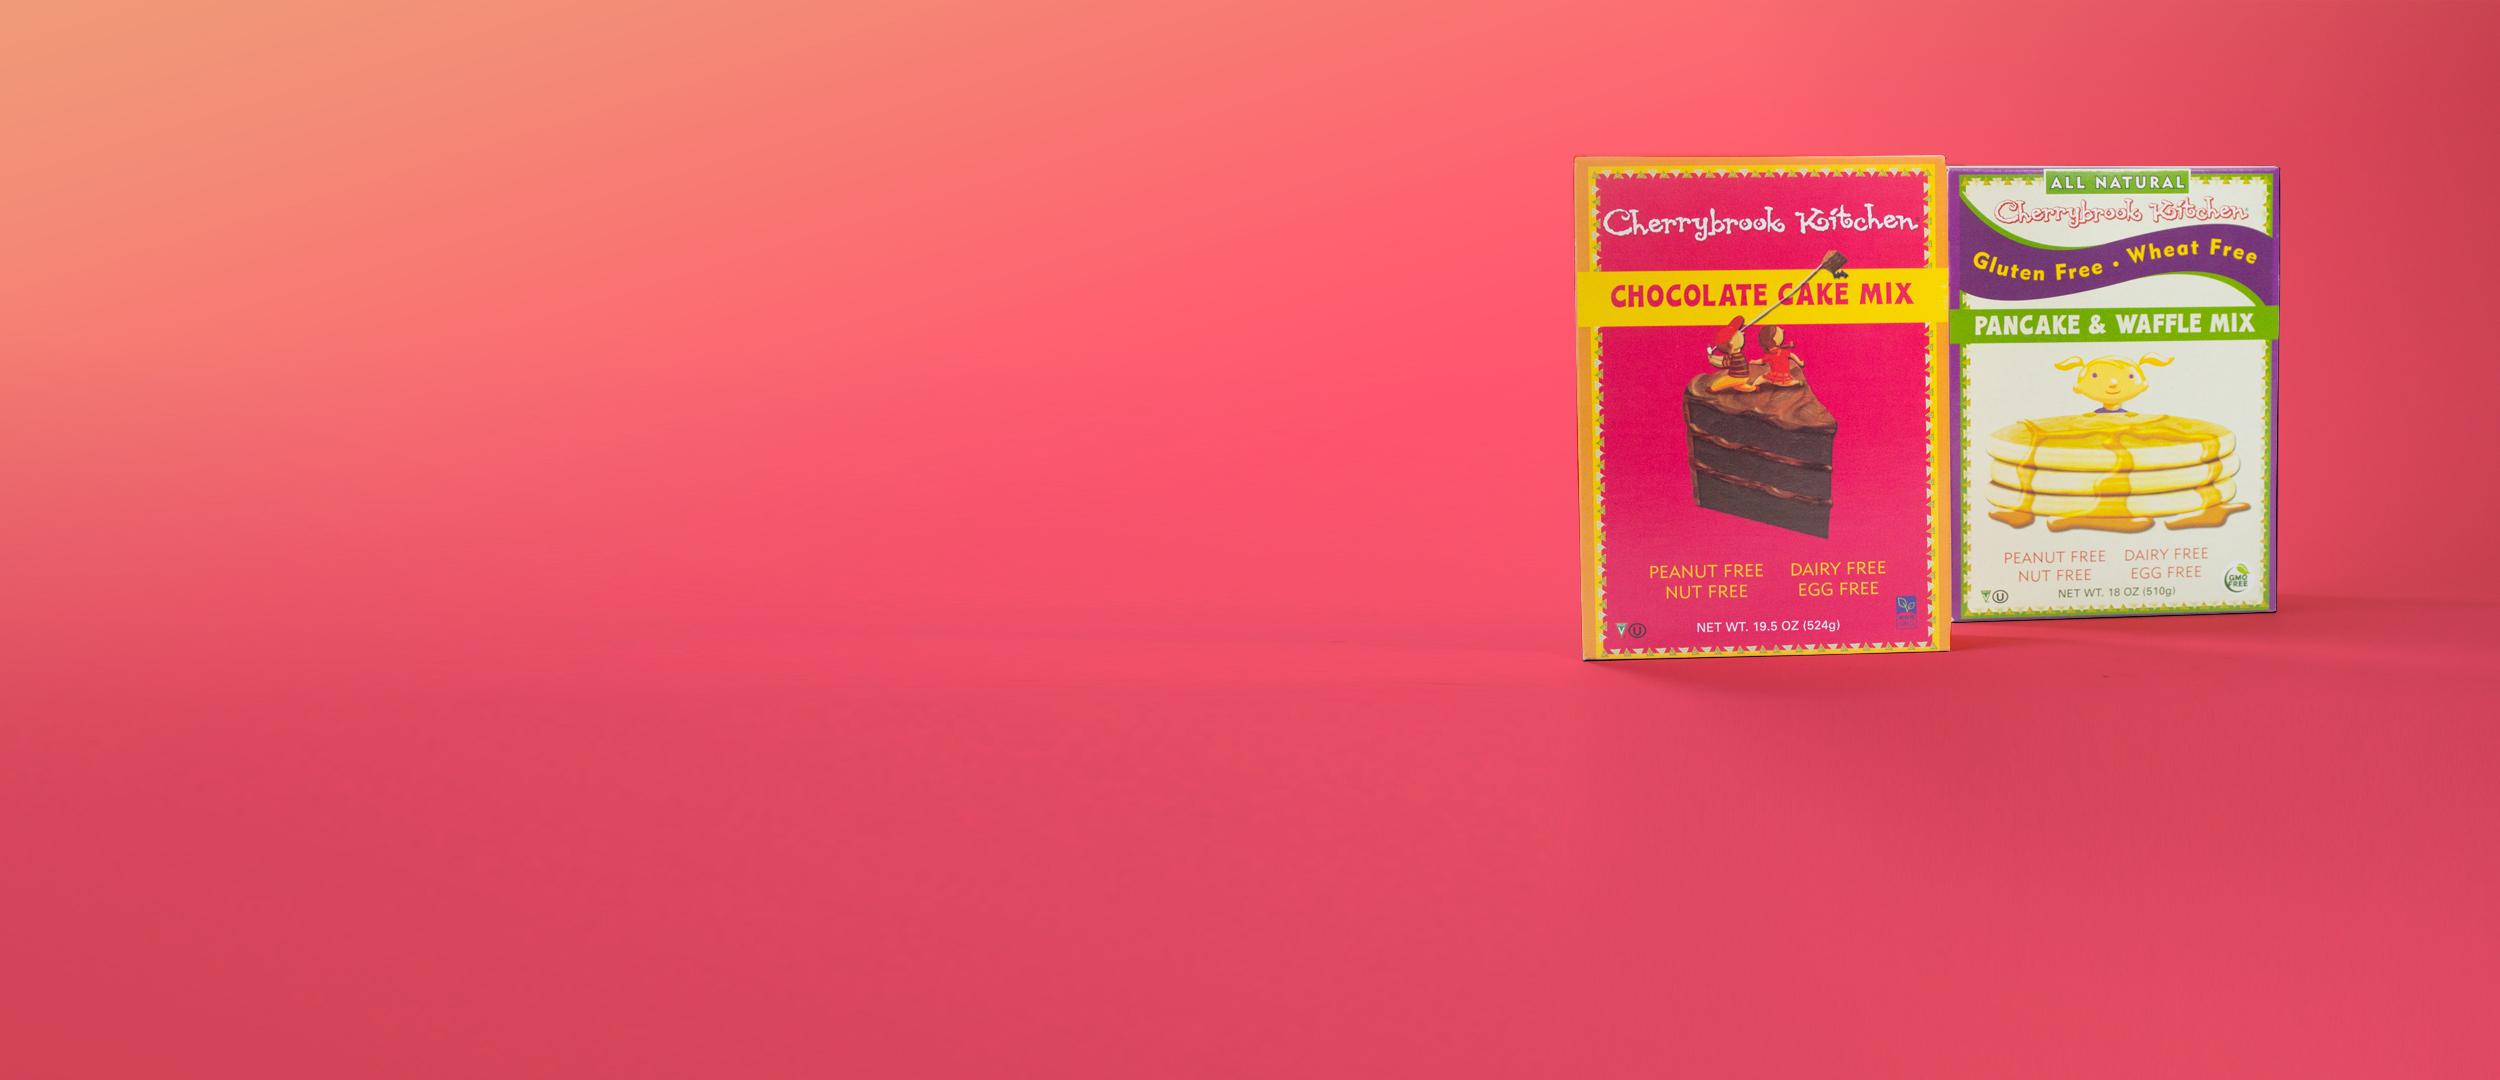 oz catalog dreams cache c back cookie cherrybrook h sugar media image freshbeak kitchen mix gluten s free com product